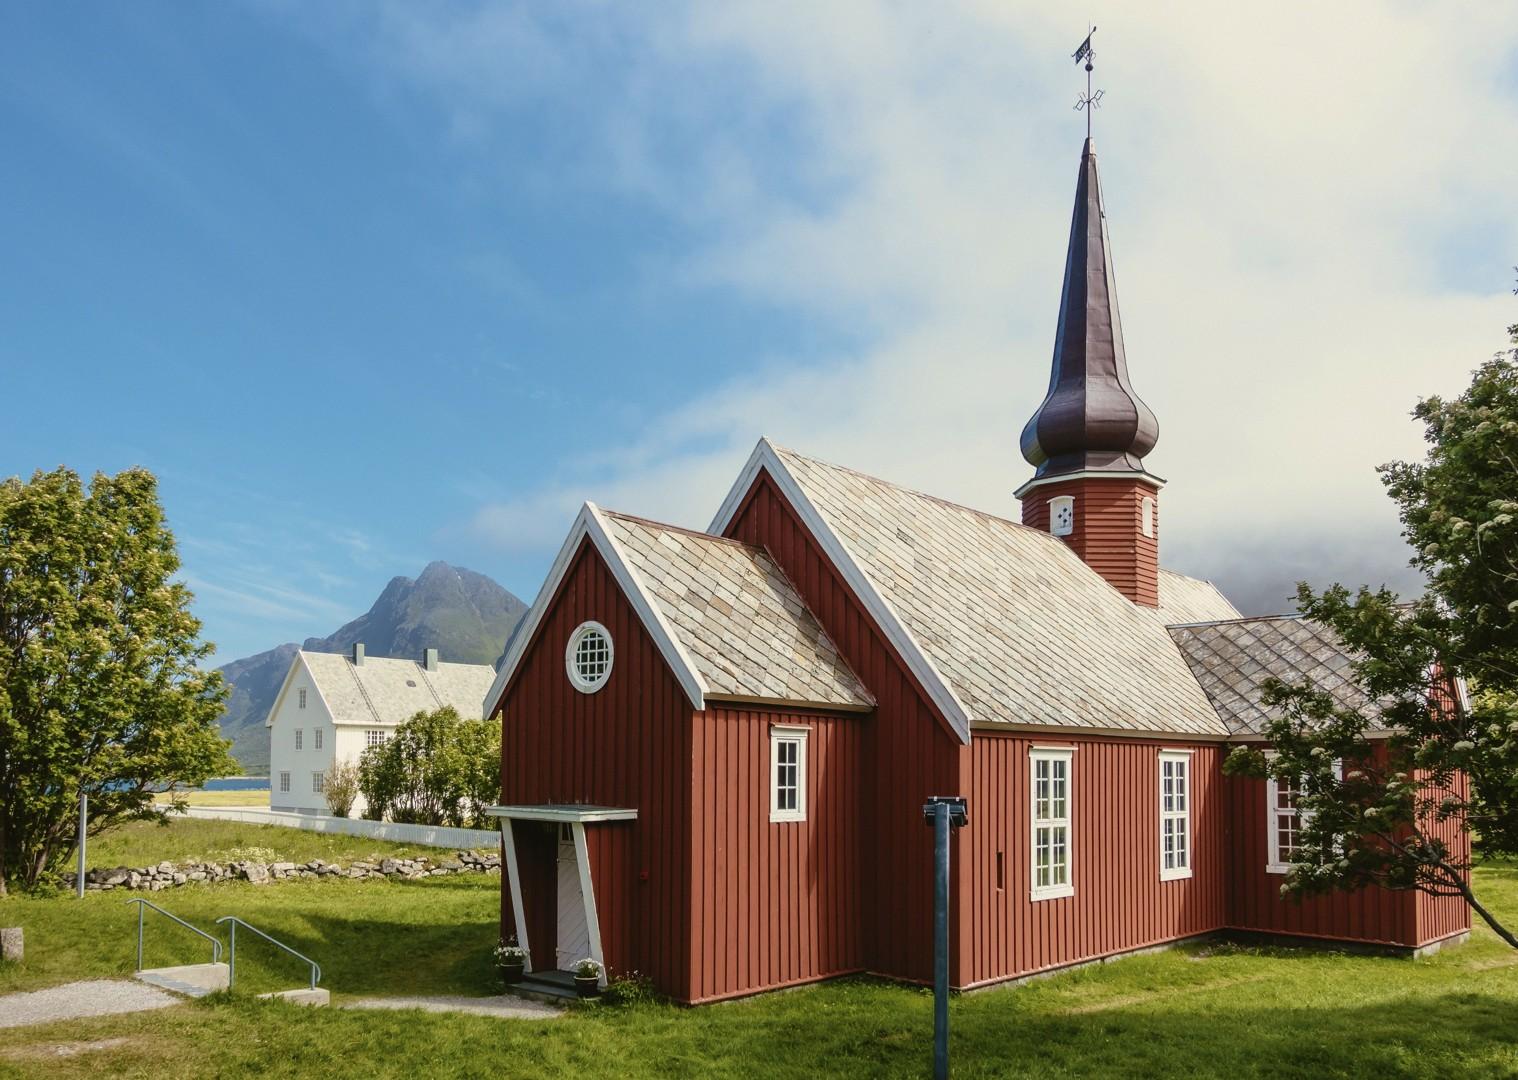 leisure-cycling-holiday-lofoten-house.jpg - Norway - Lofoten Islands - Self-Guided Leisure Cycling Holiday - Leisure Cycling